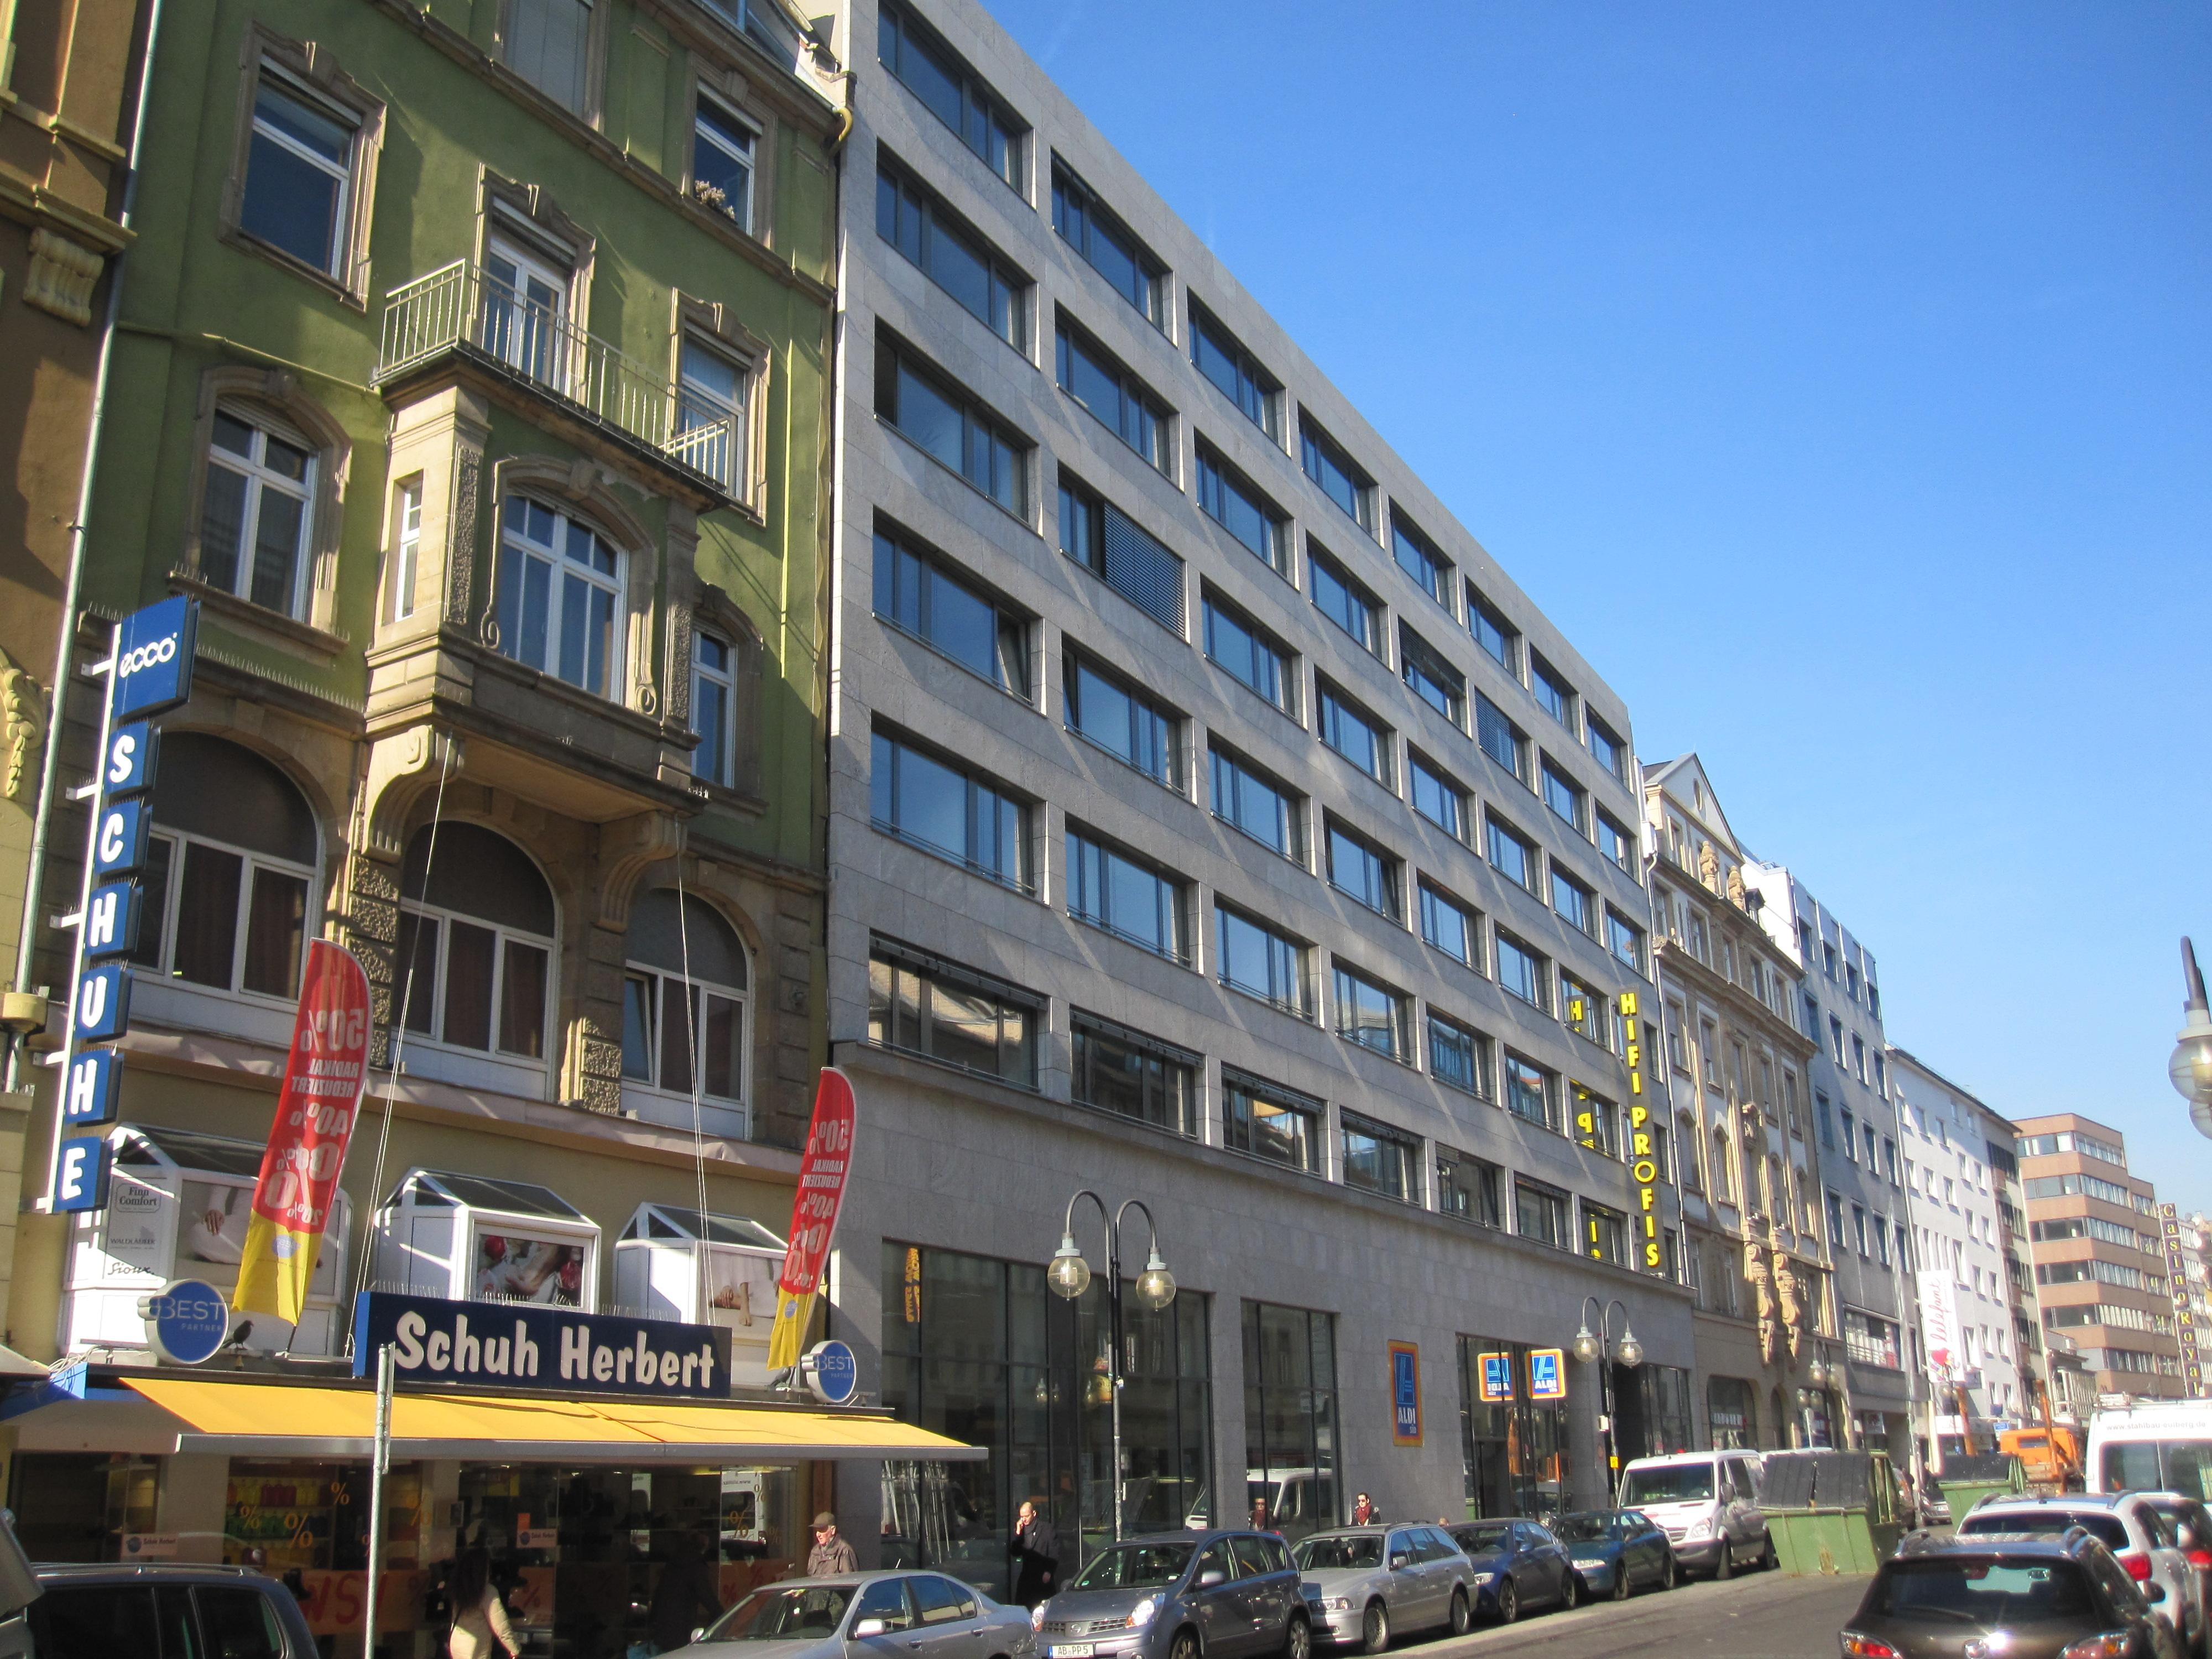 frankfurt am main gro e friedberger stra e 23 27 dietz ag. Black Bedroom Furniture Sets. Home Design Ideas